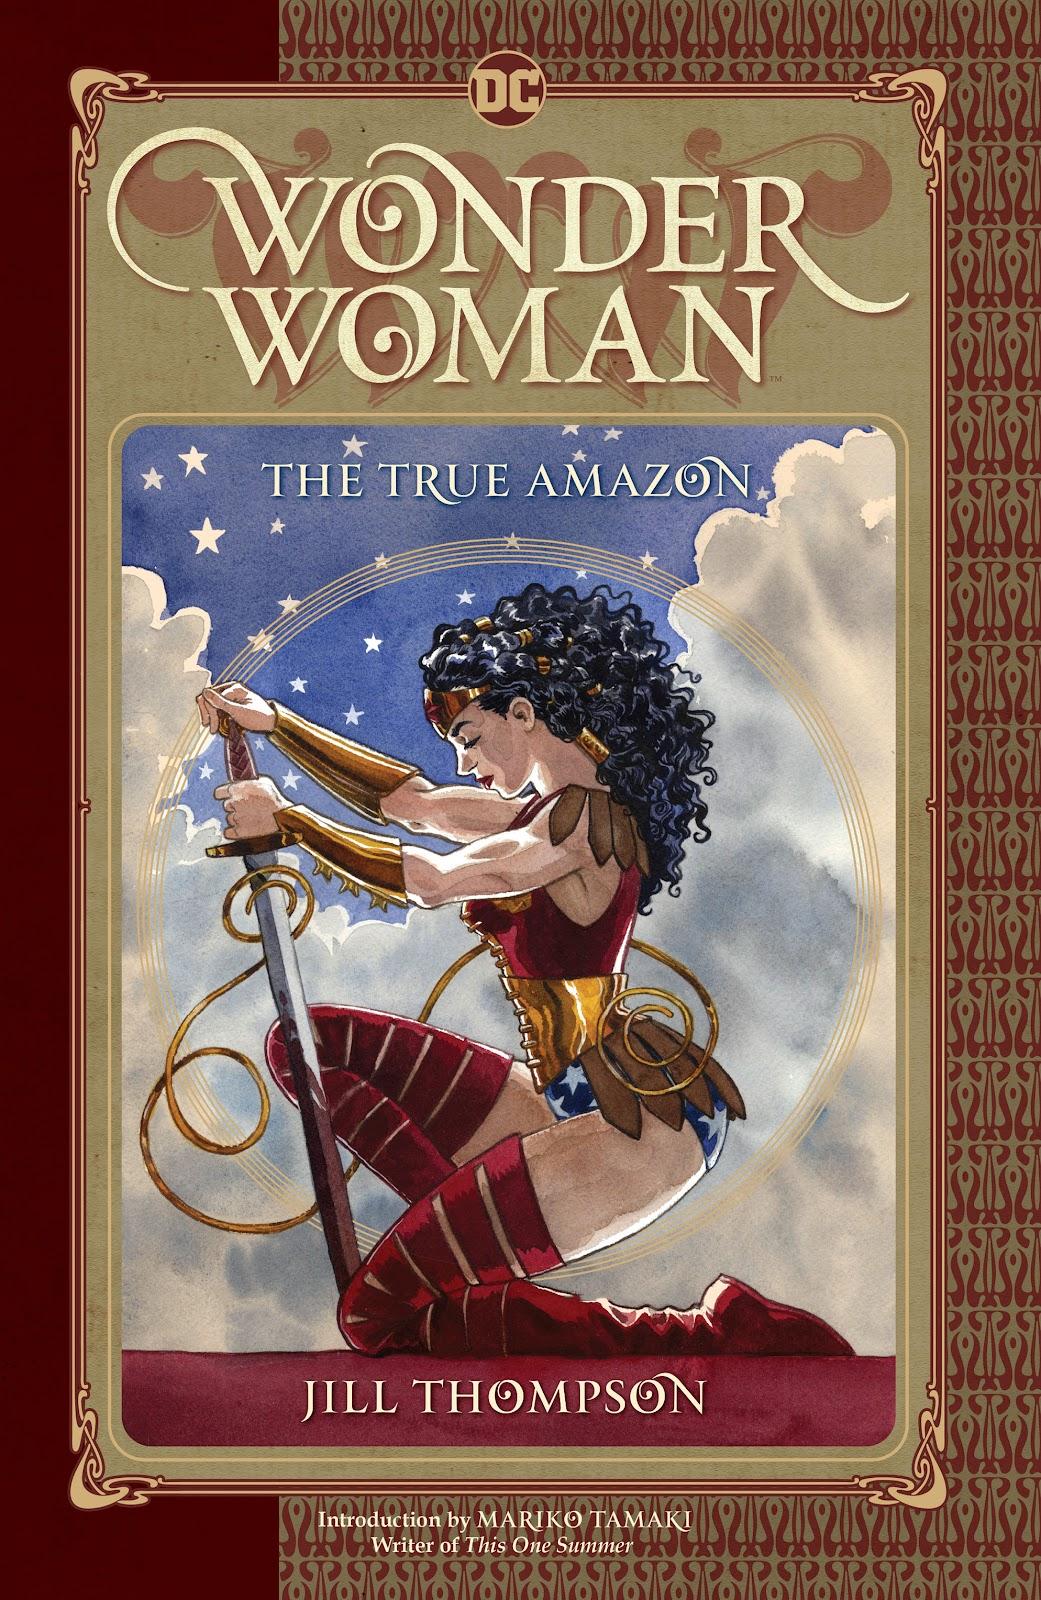 Wonder Woman: The True Amazon Full Page 1